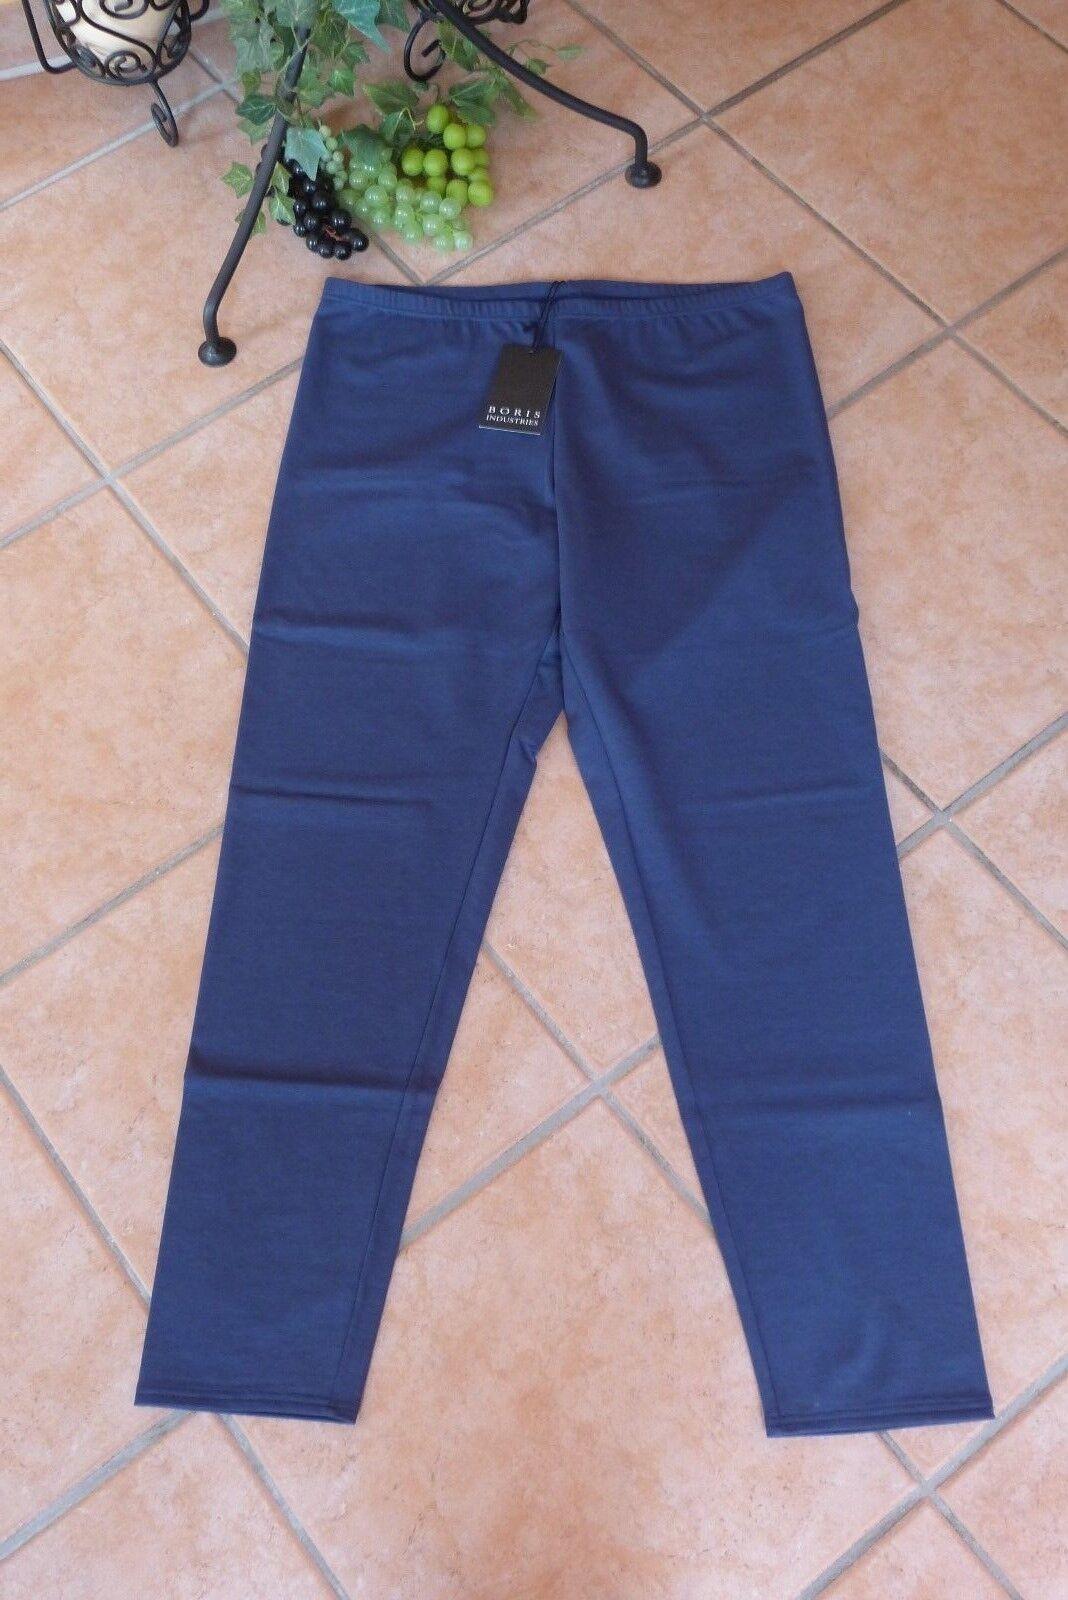 BORIS INDUSTRIES Leggings Winter 40 42 (2) NEU jeansblue Double Face LAGENLOOK